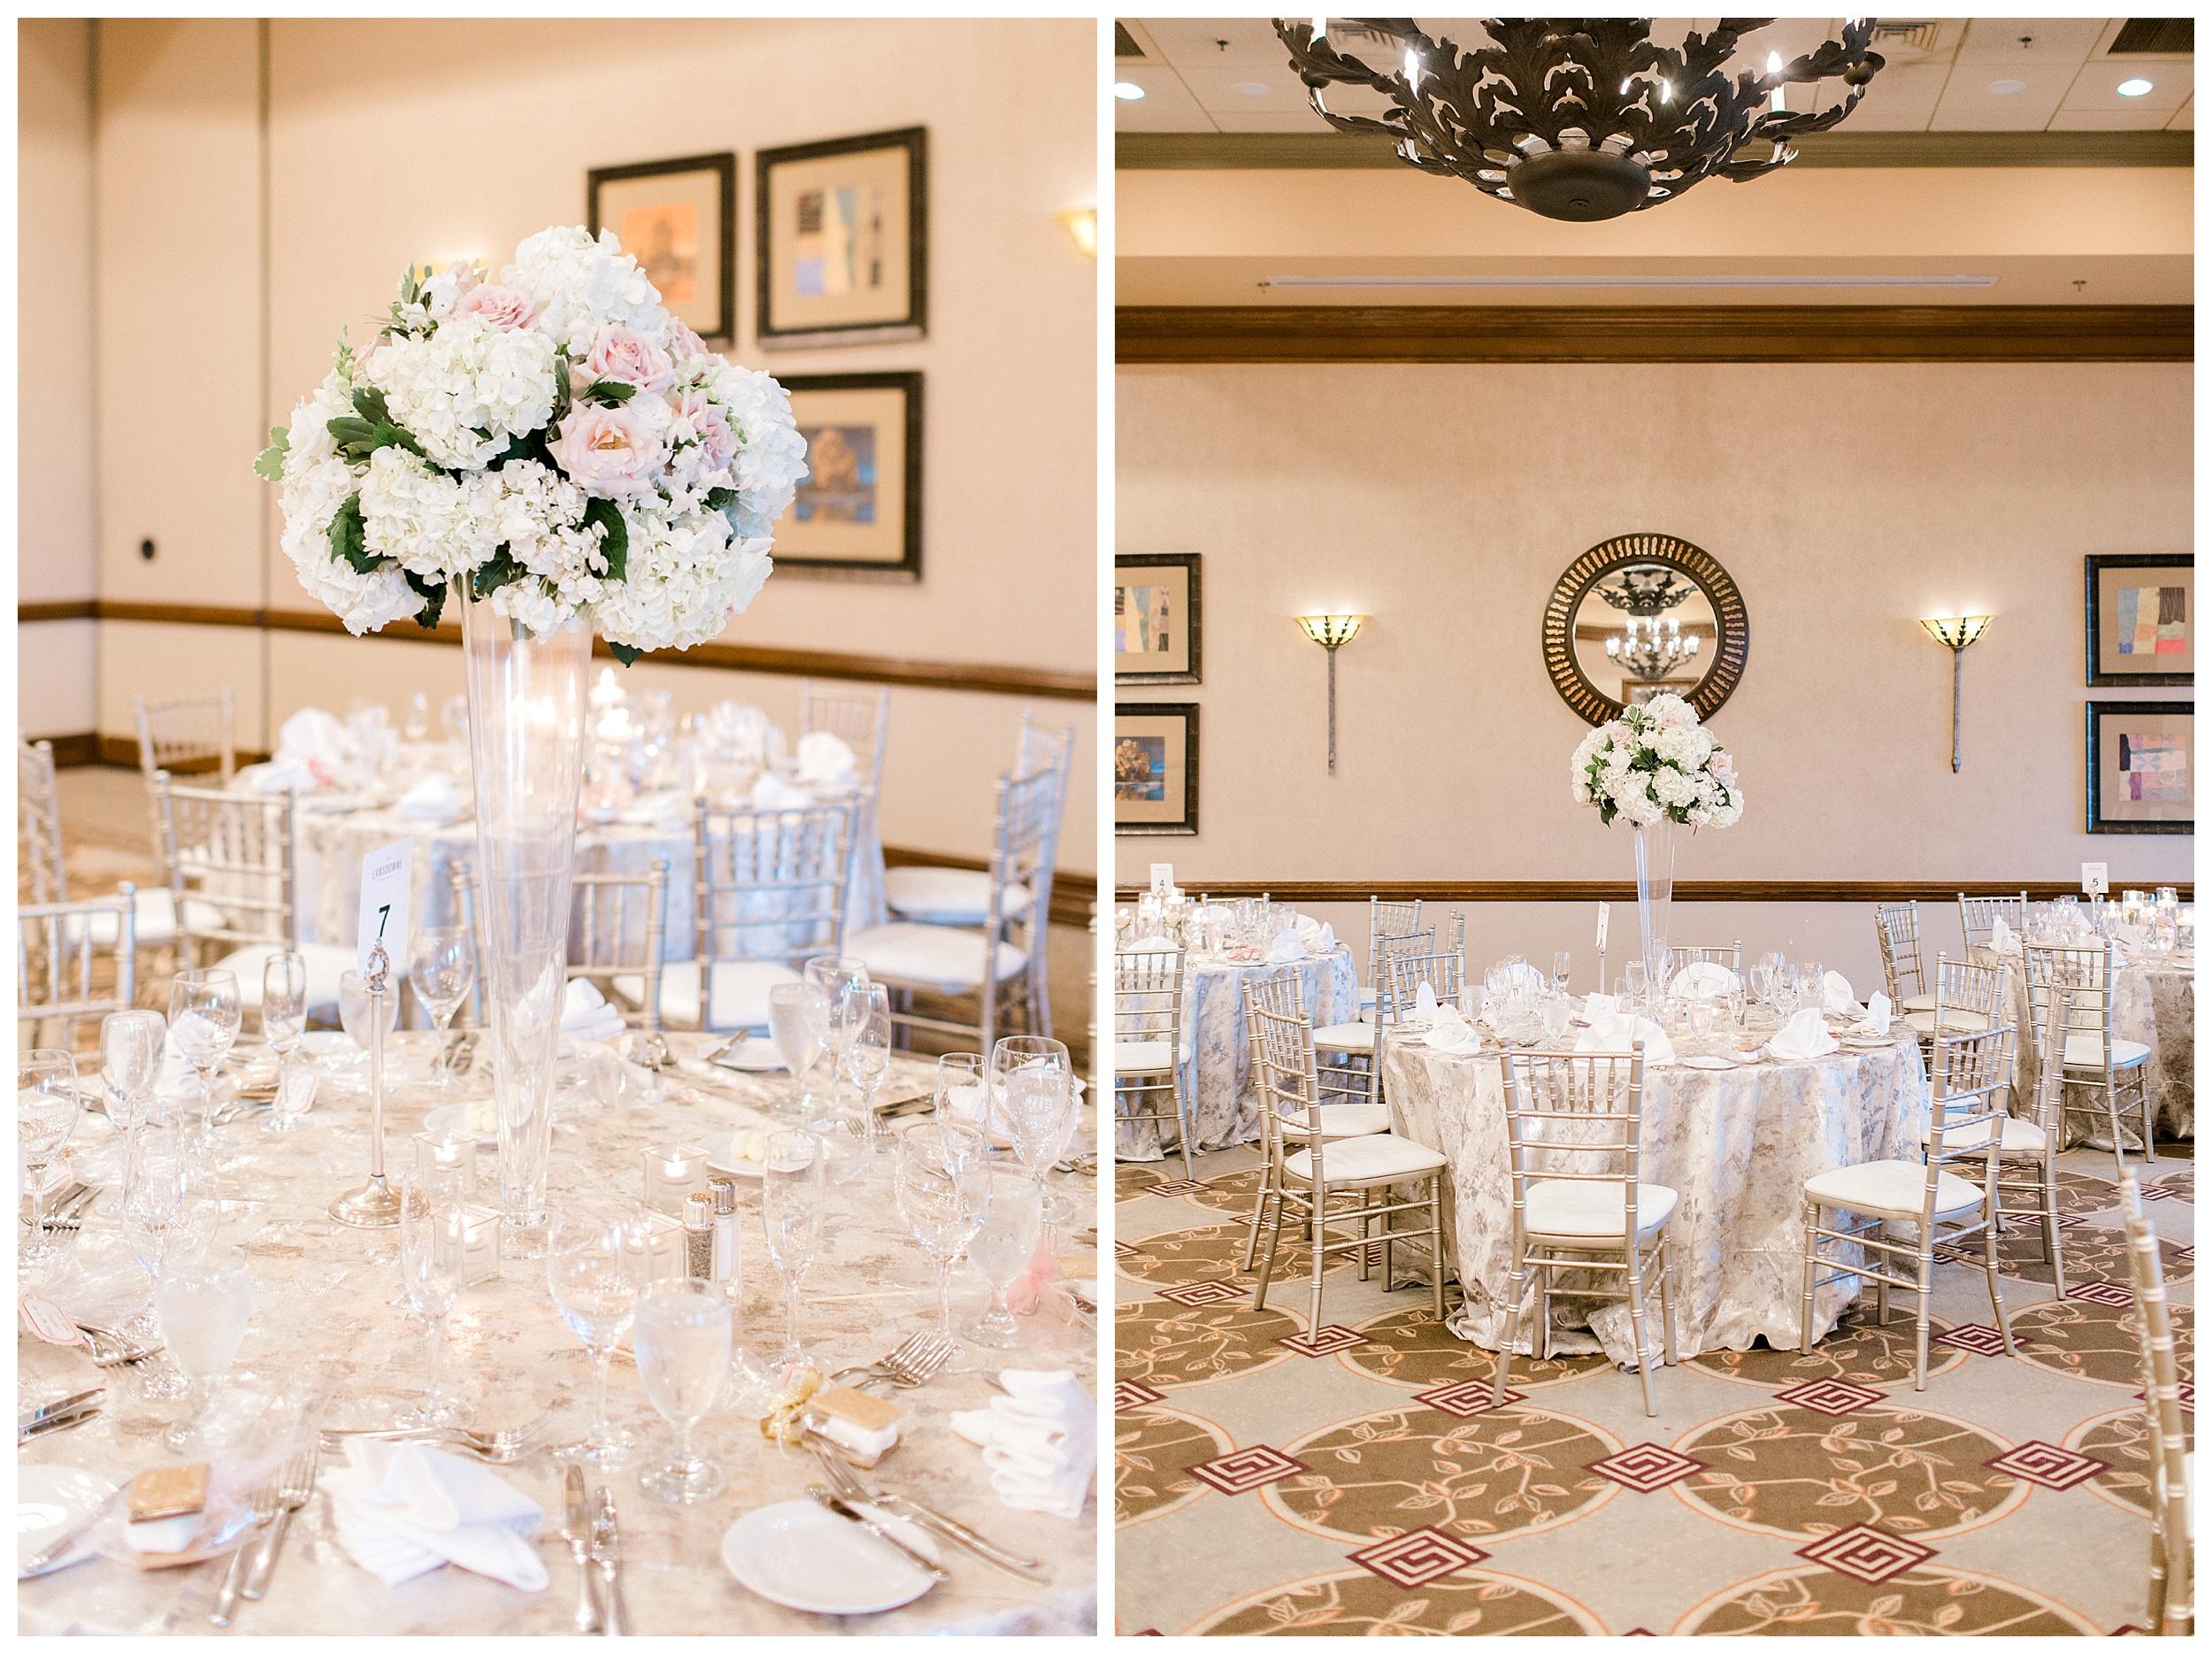 Lansdowne Resort Wedding | Virginia Film Wedding Photographer Kir Tuben_0060.jpg